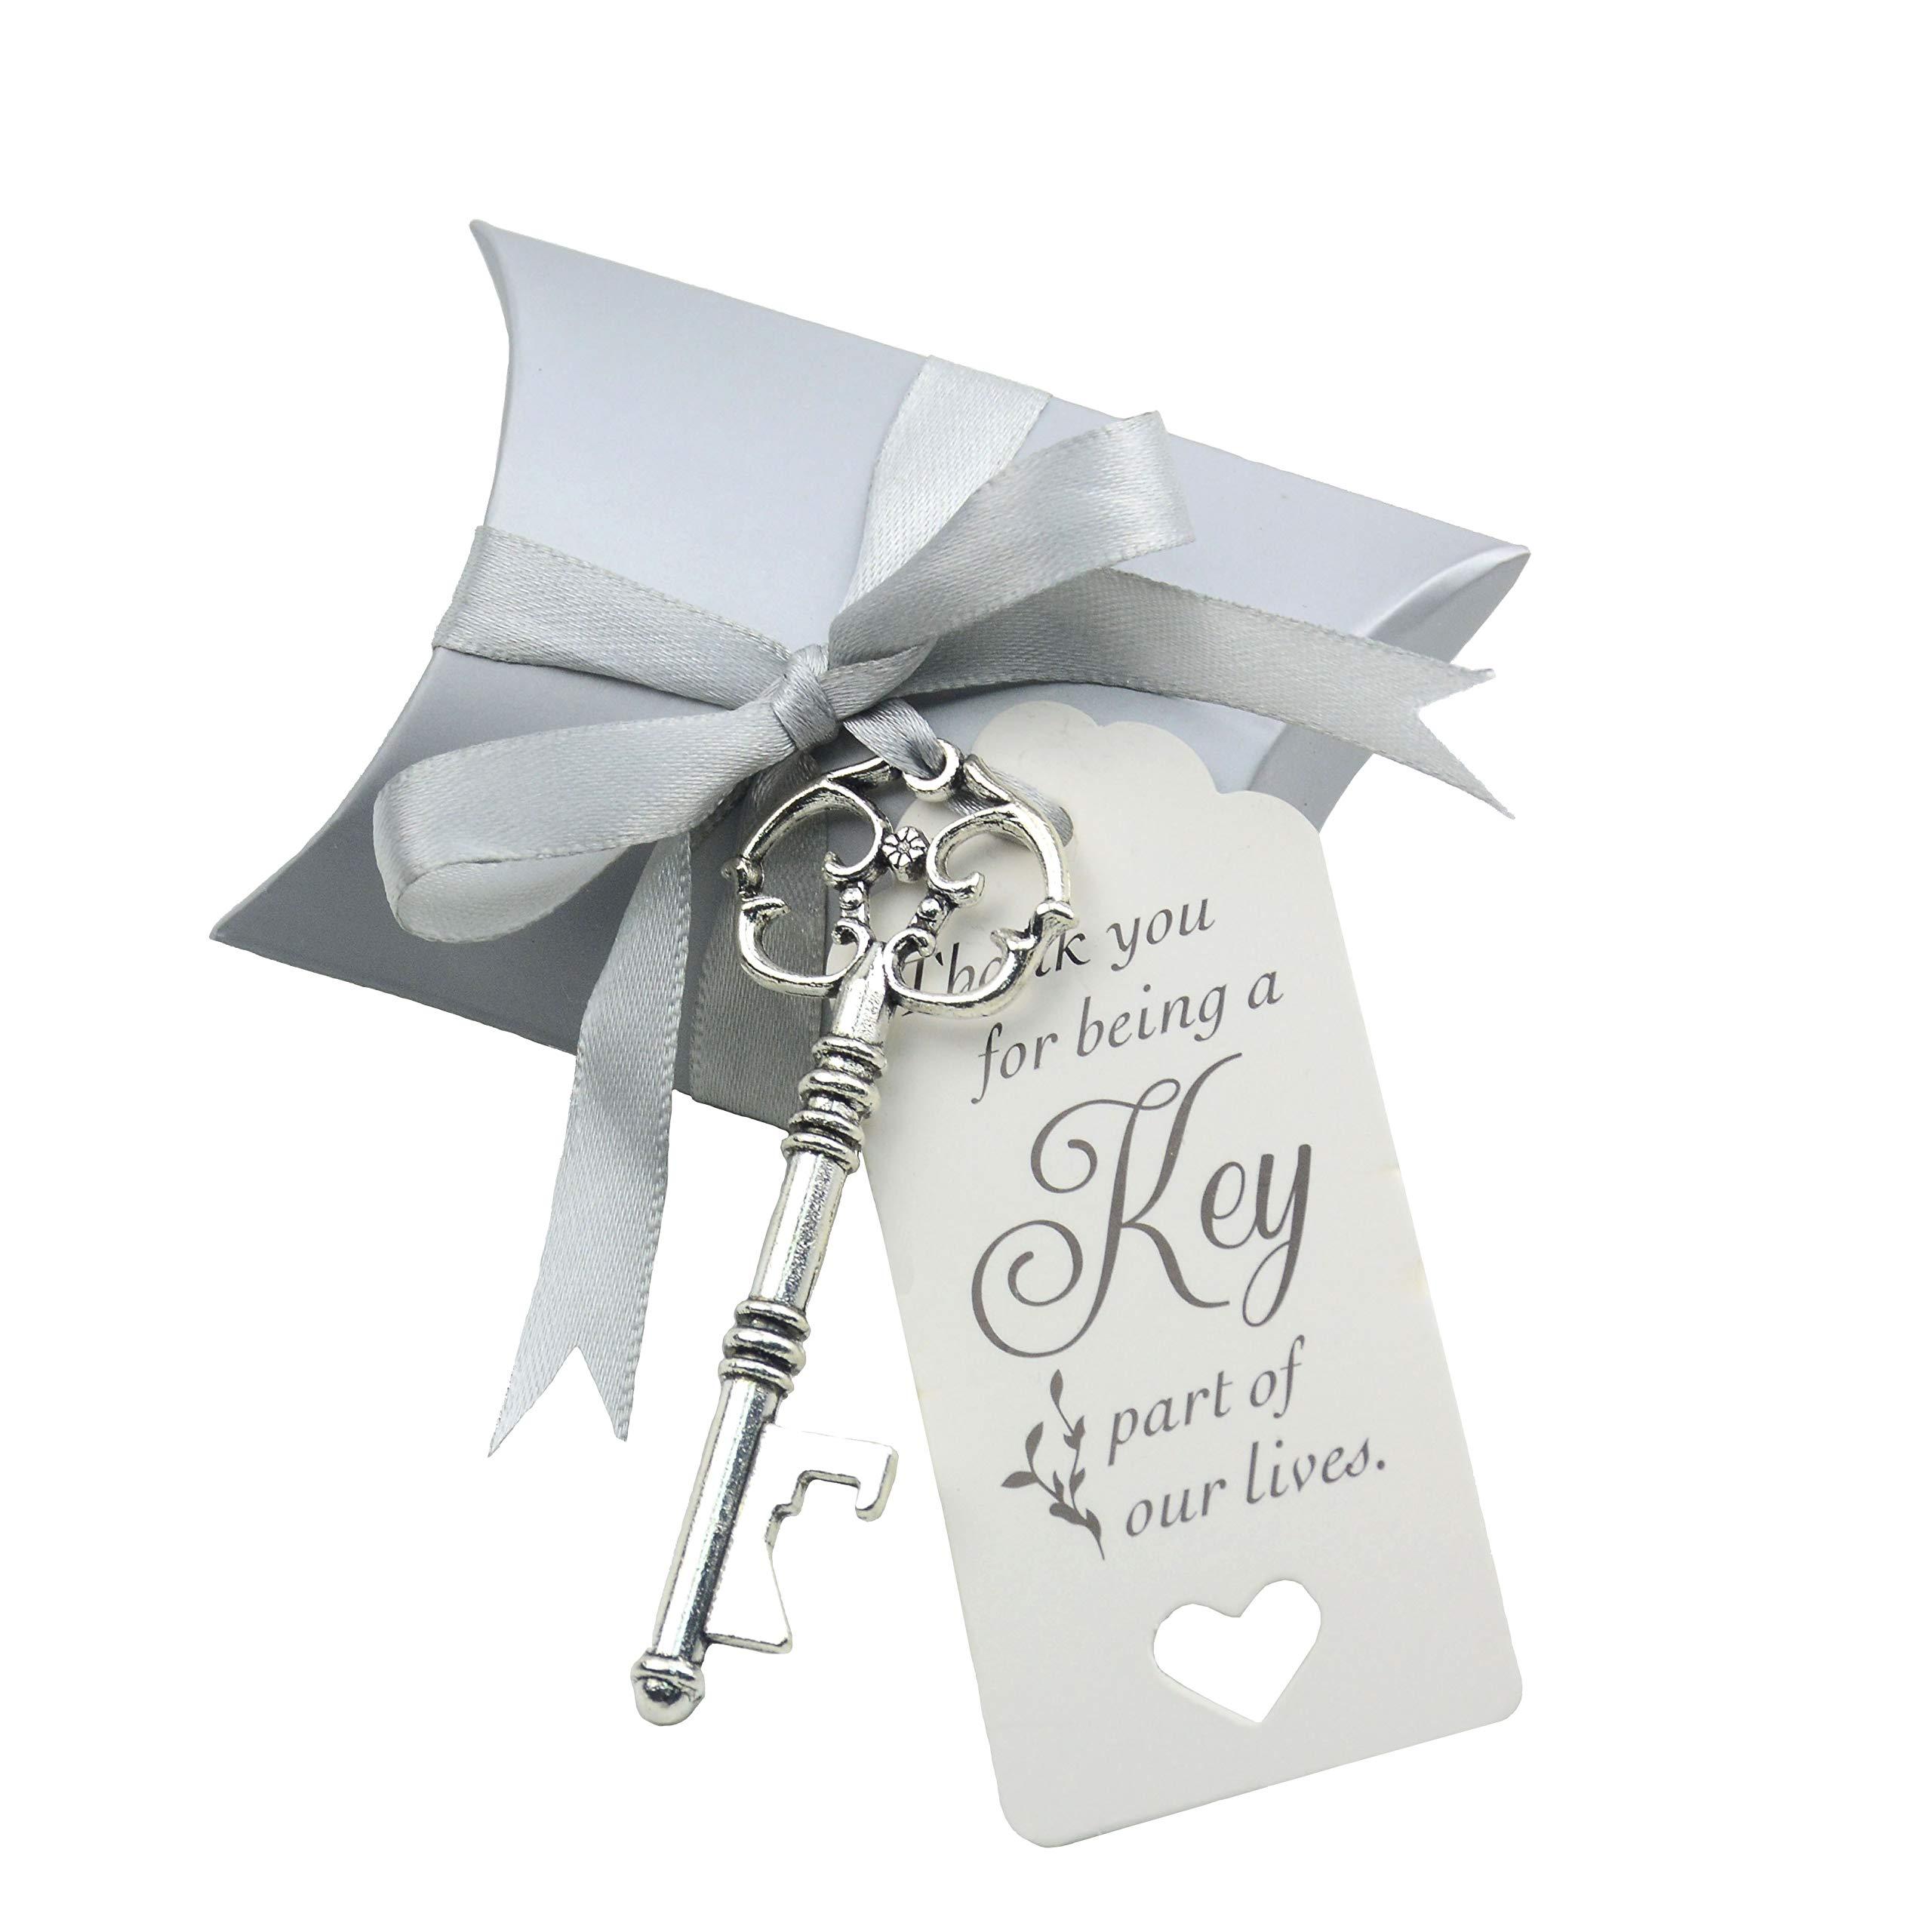 50pcs Wedding Favor Souvenir Gift Set Pillow Candy Box Vintage Skeleton Key Bottle Openers Escort Gift Card Thank You Tag French Ribbon (Antique Silver)